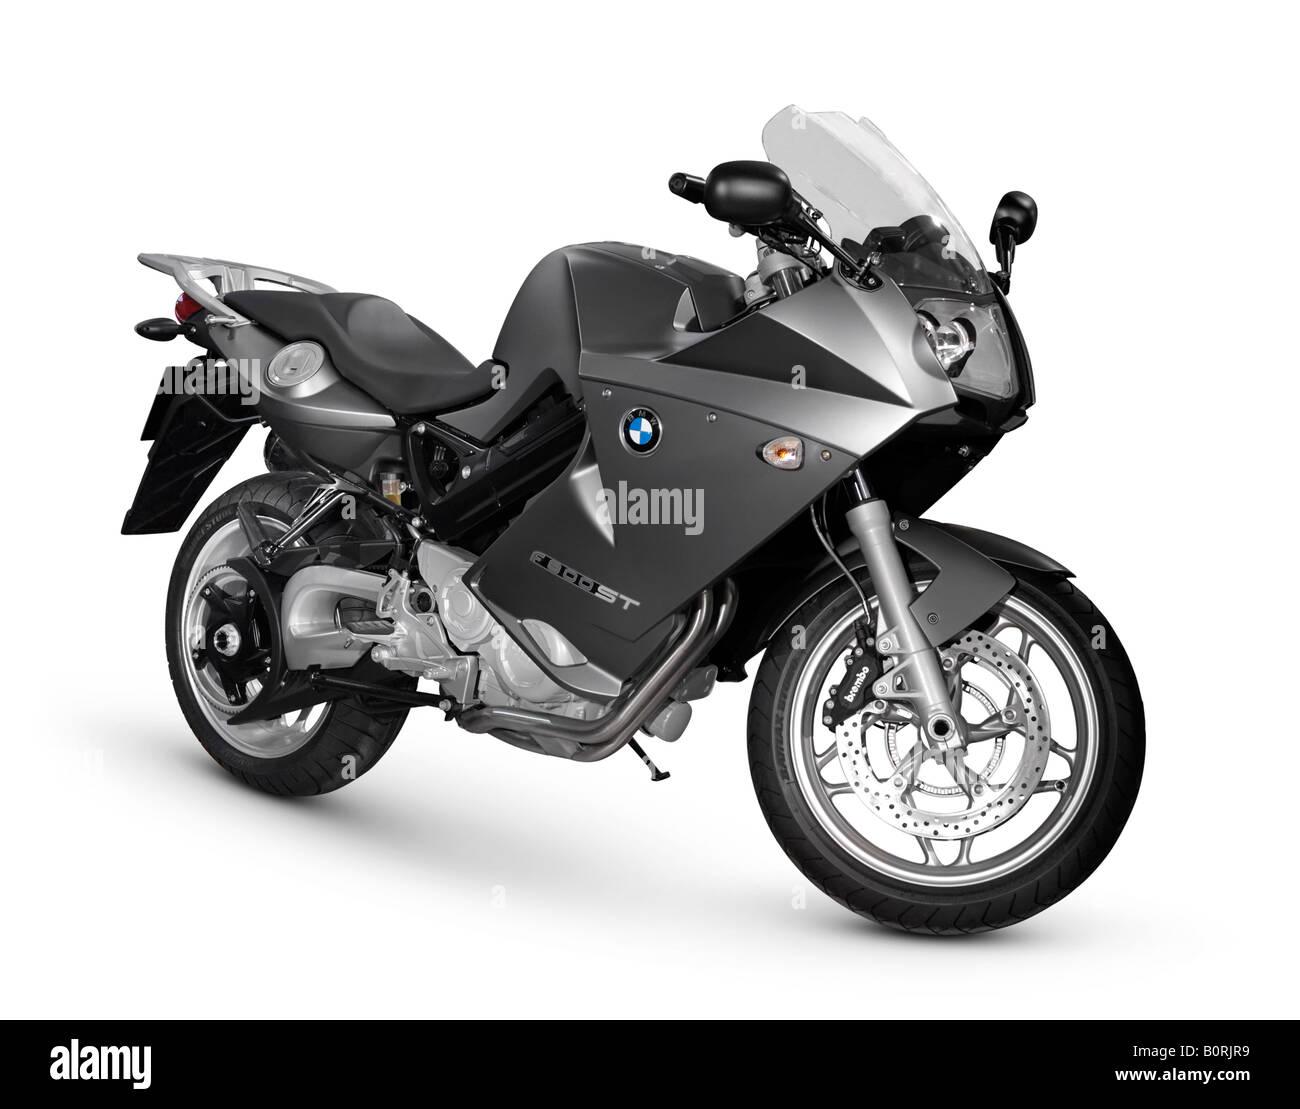 2007 BMW F 800 ST - Stock Image